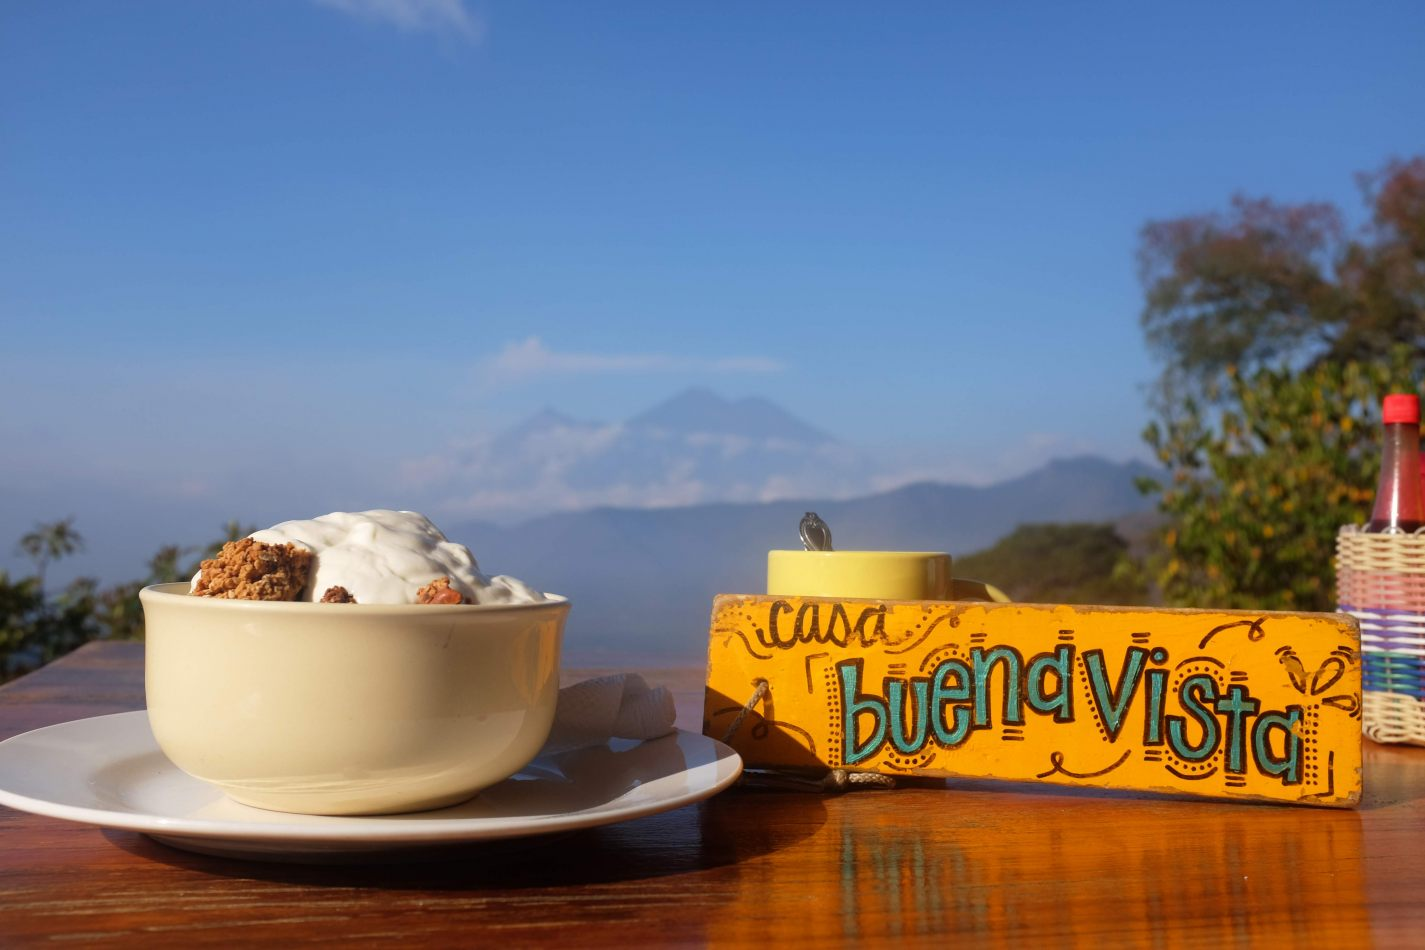 Hibiscus & Nomada : - - Granola, Fruits, Yogurt at Earth Lodge